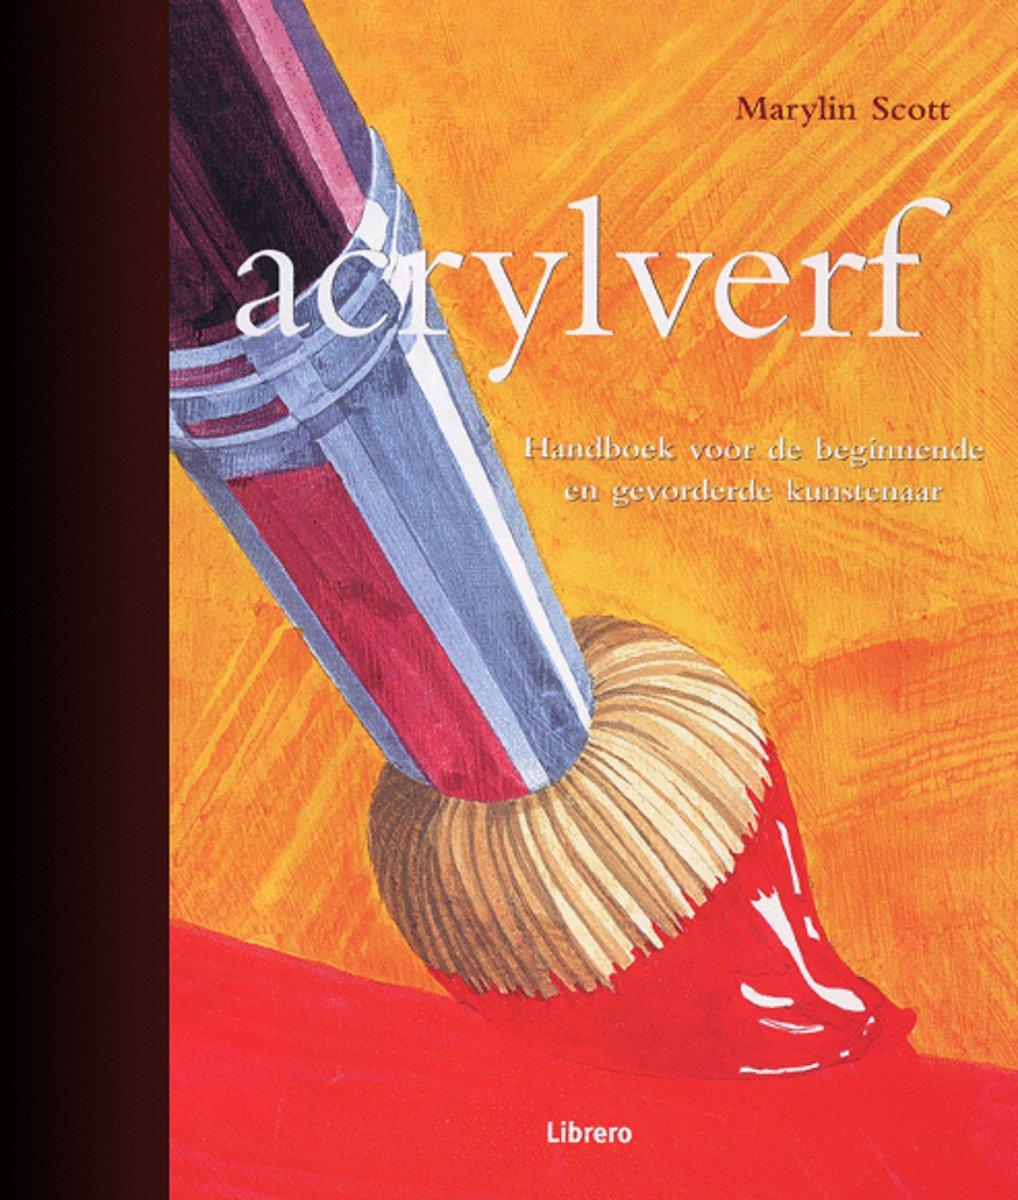 Acrylverf handboek